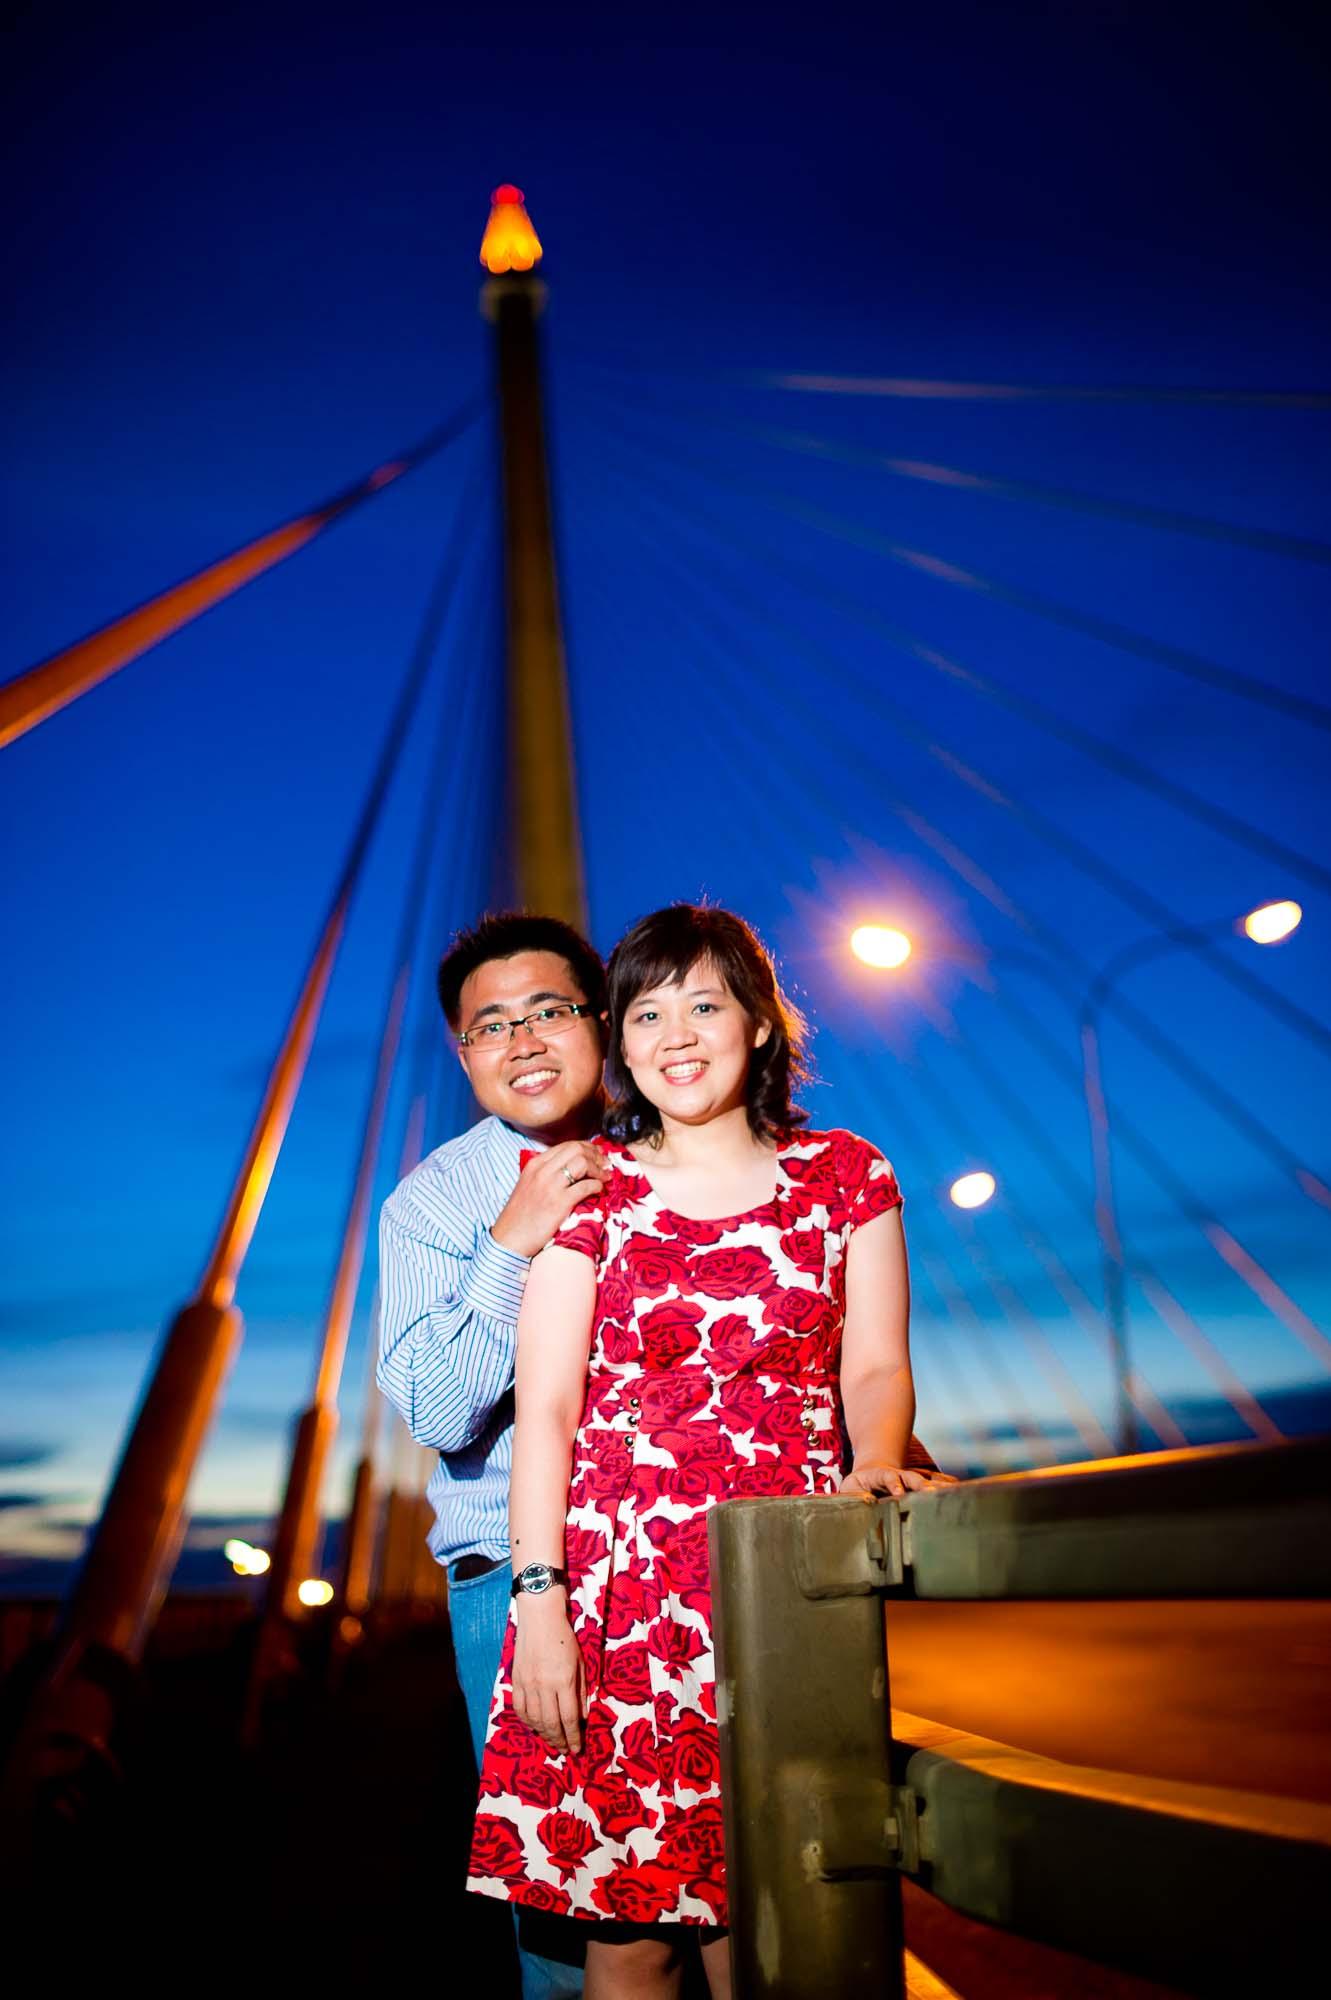 Thailand Bangkok Rama VIII Suspension Bridge Wedding Photography | NET-Photography Thailand Wedding Photographer